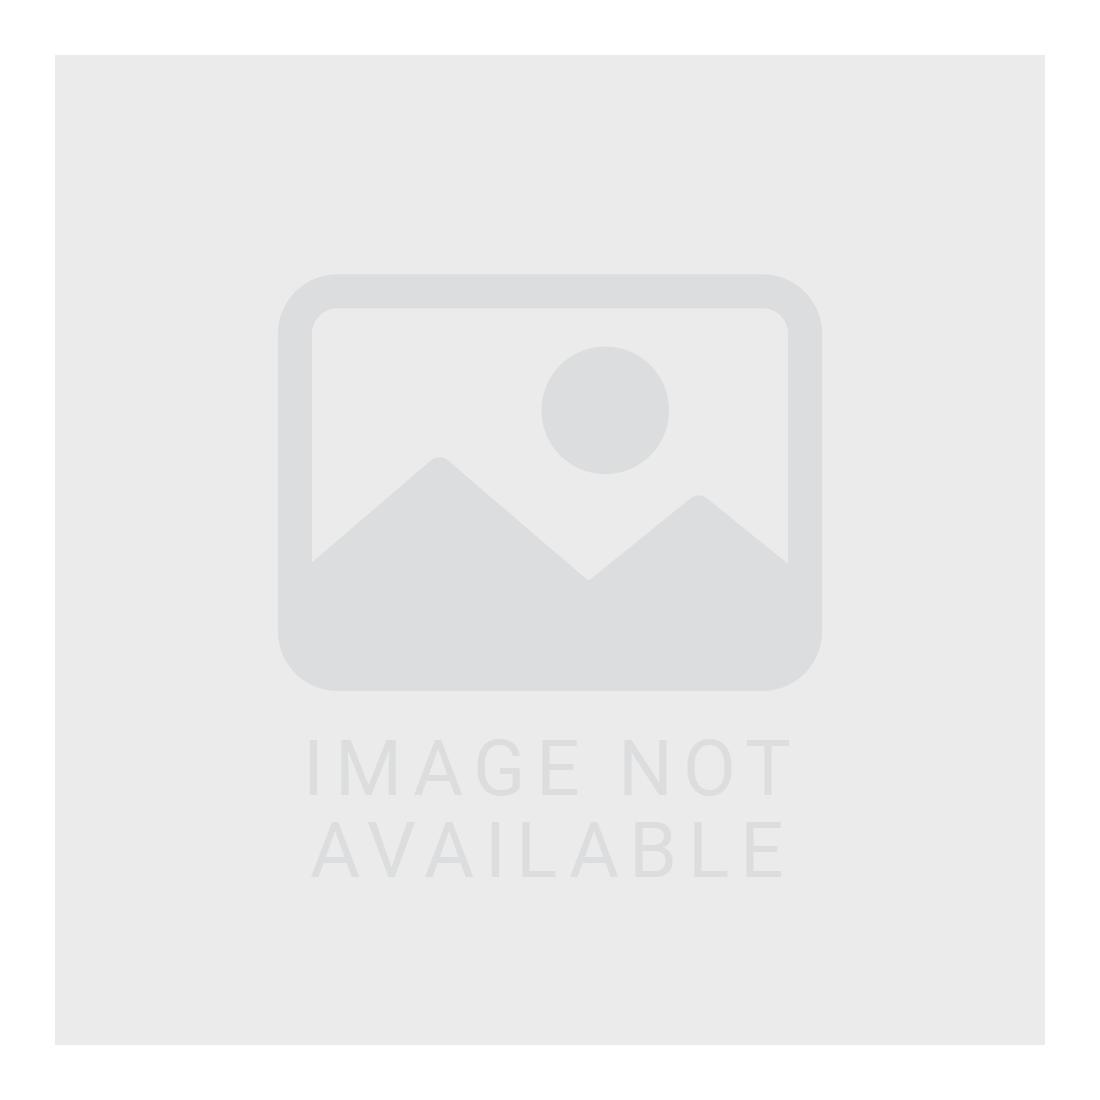 Angry Bee 1320 Slim Line LED Sign